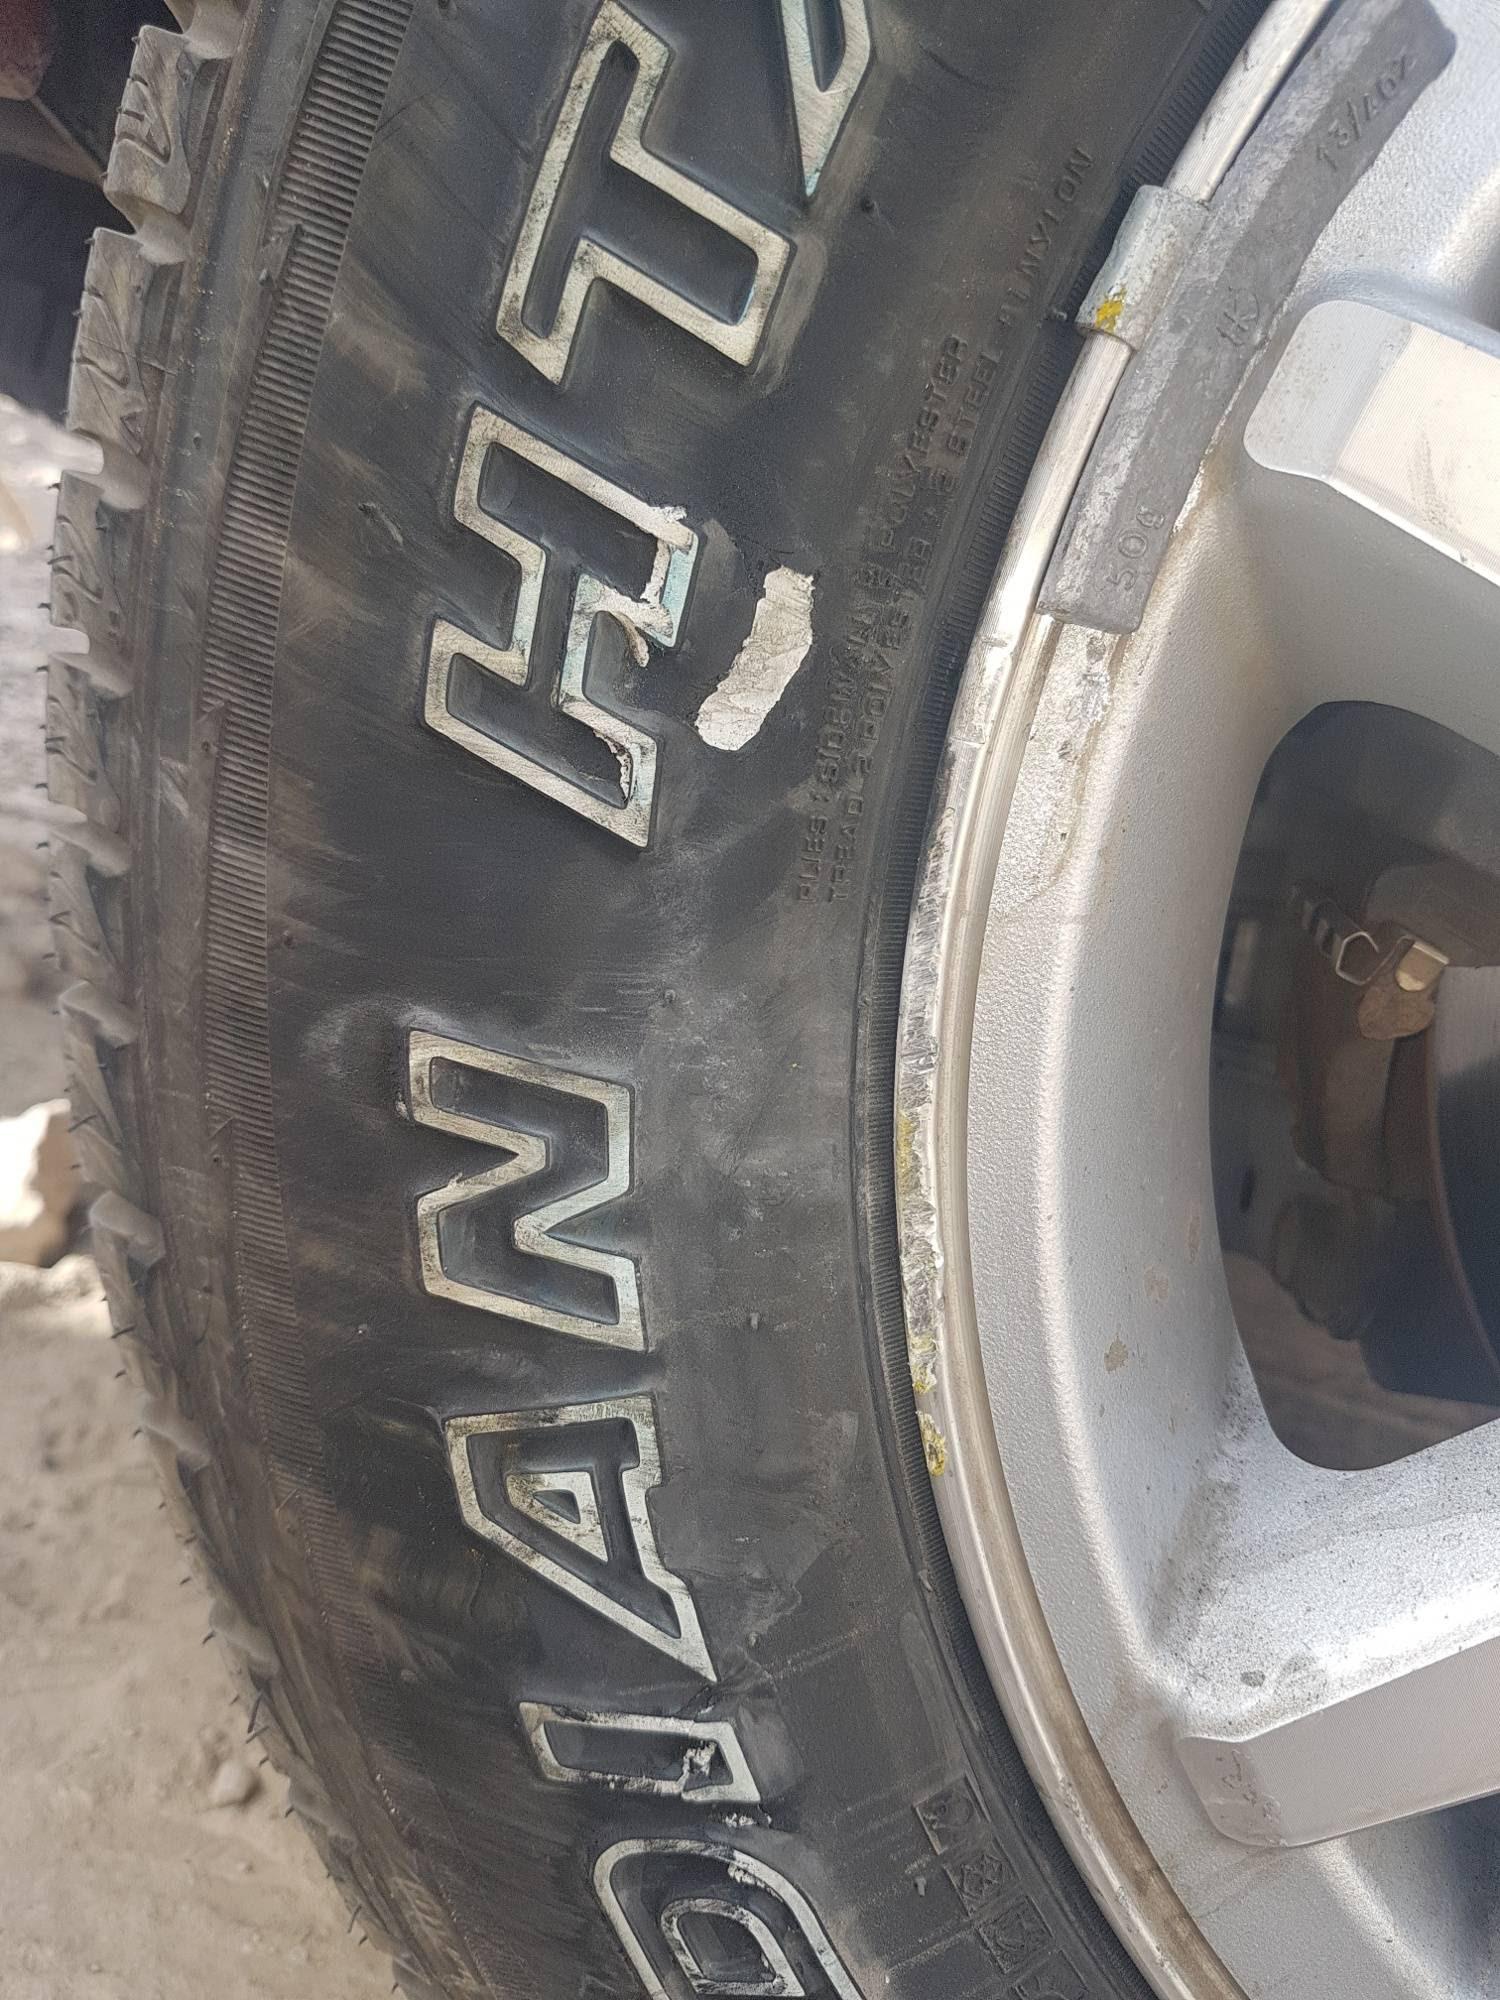 Tire Sidewall Damage In New Tire Should I Change It